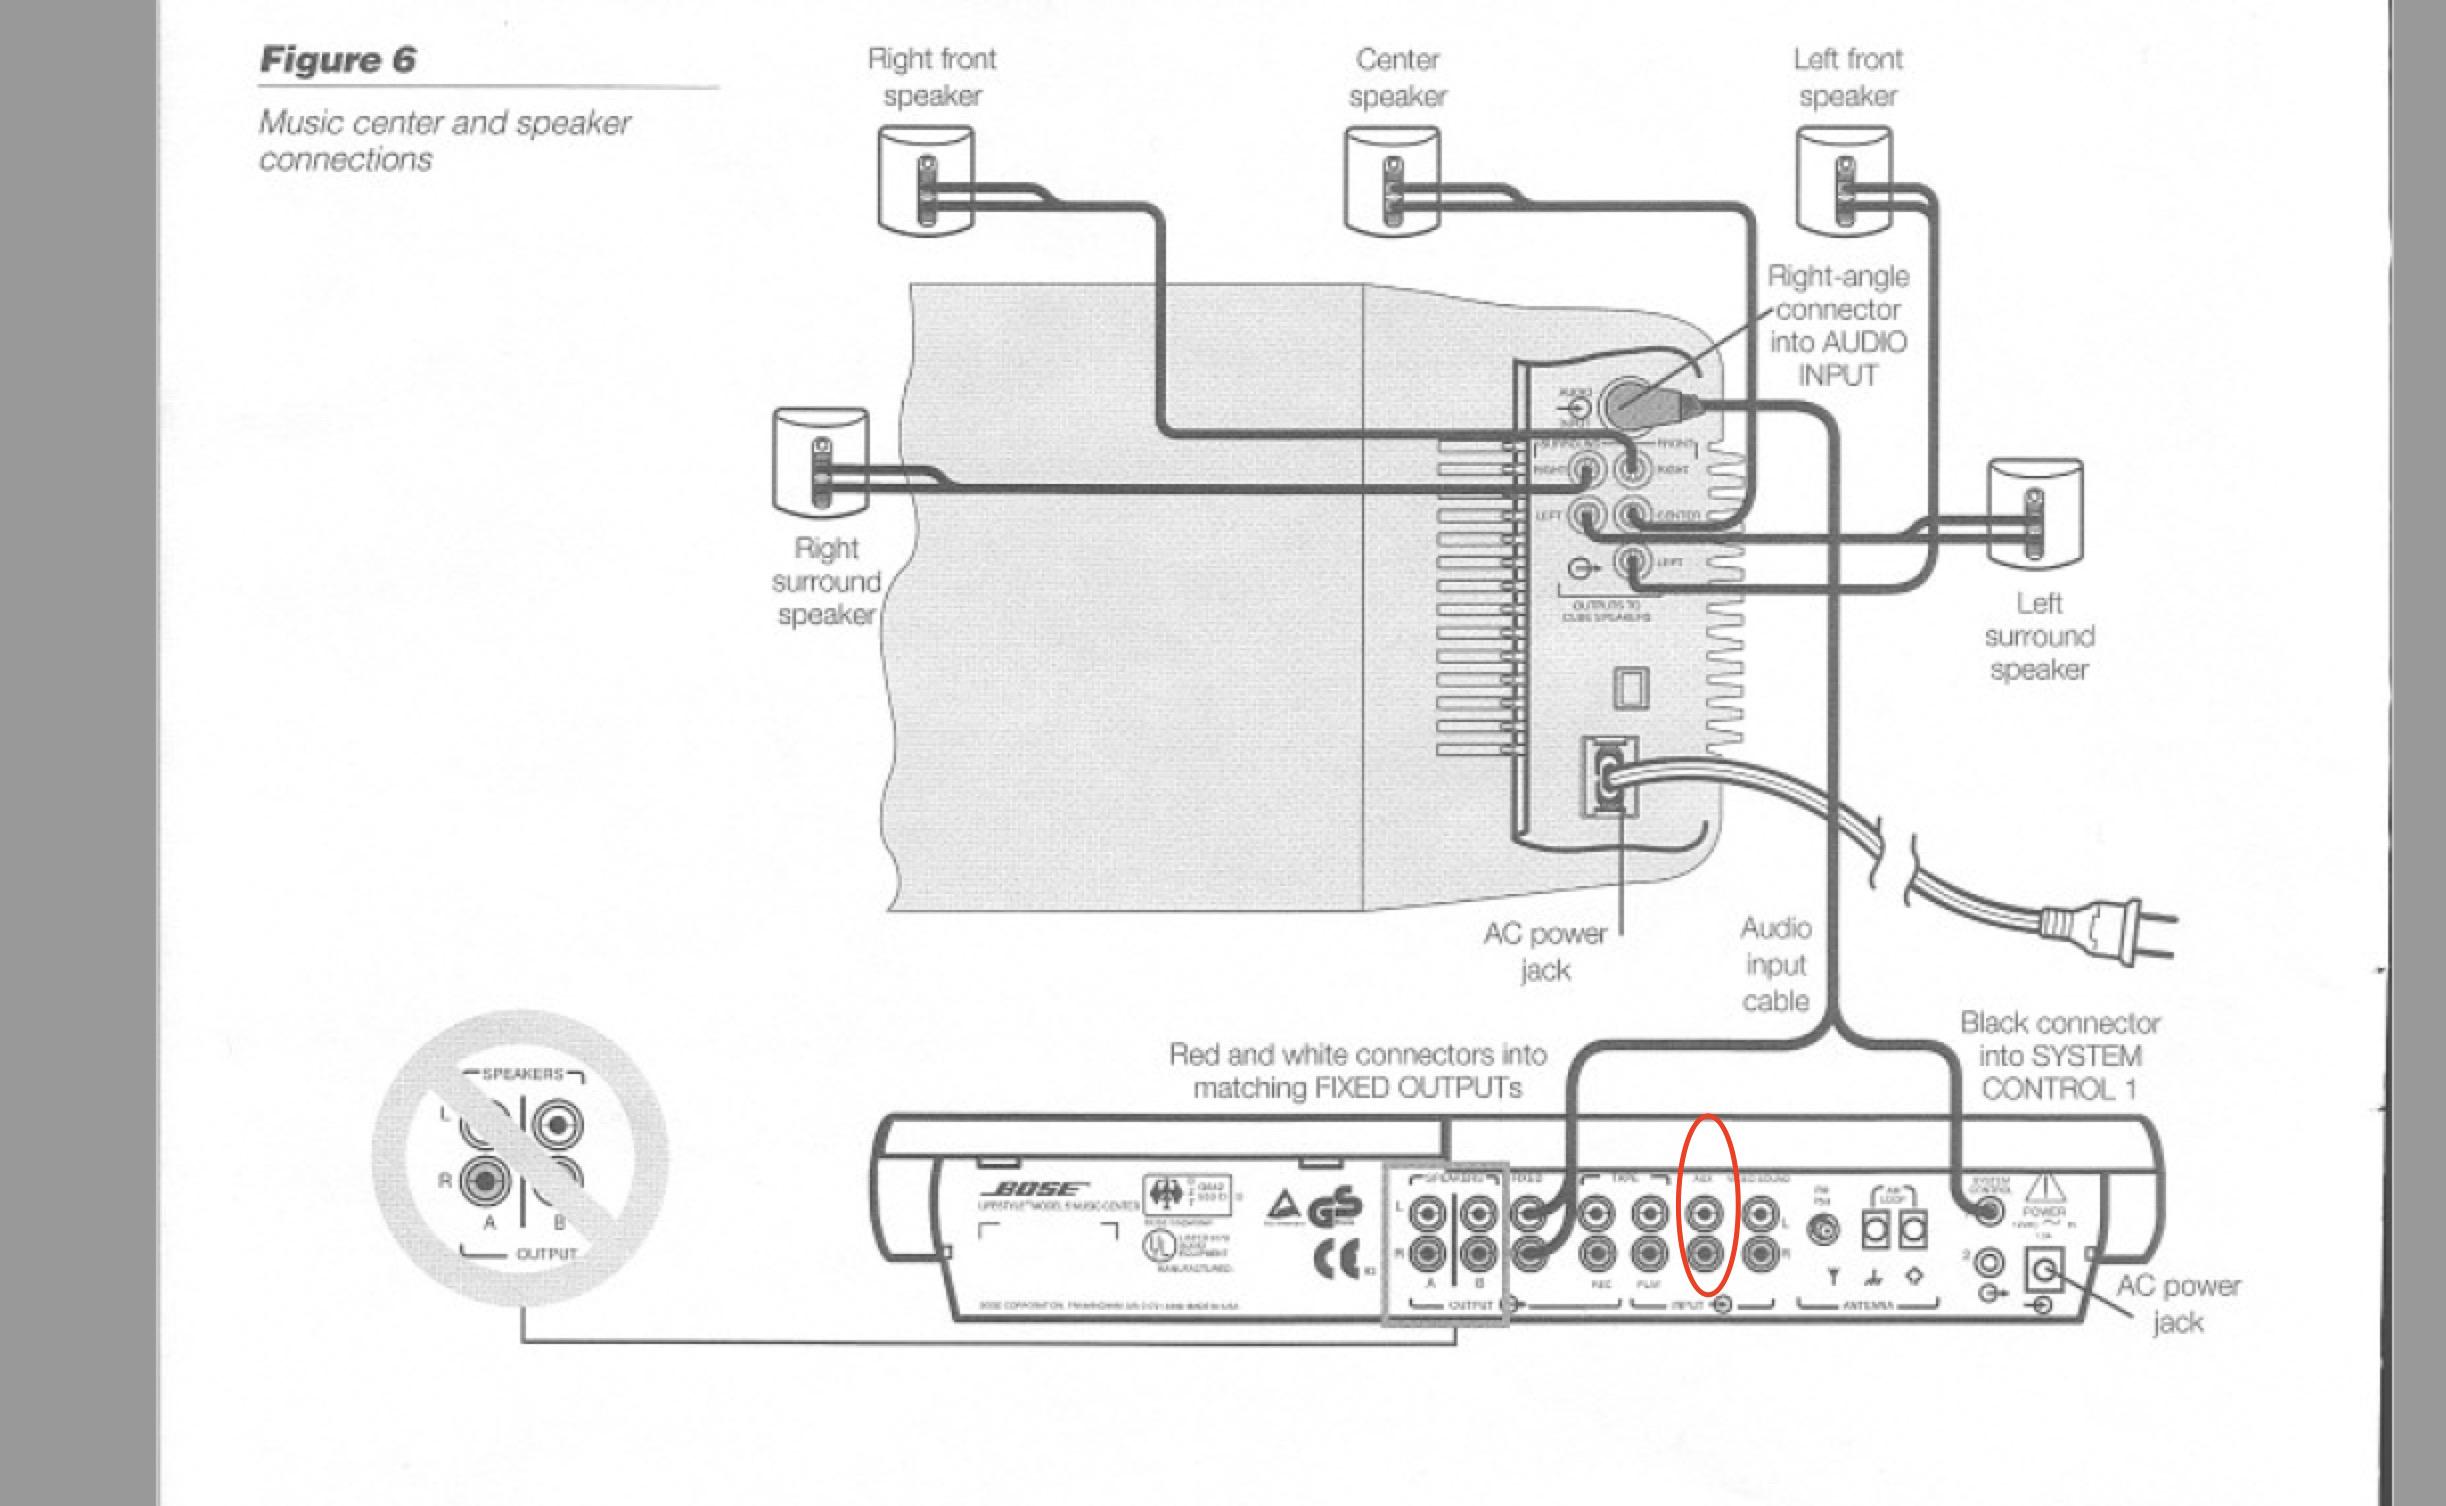 [SCHEMATICS_4ER]  MB_6582] Bose Lsps Speaker System Wiring Diagram Download Diagram | Bose Subwoofer Wiring Diagram Free Download |  | Icaen Nect Lukep Xaem Rele Ginia Epete Mohammedshrine Librar Wiring 101